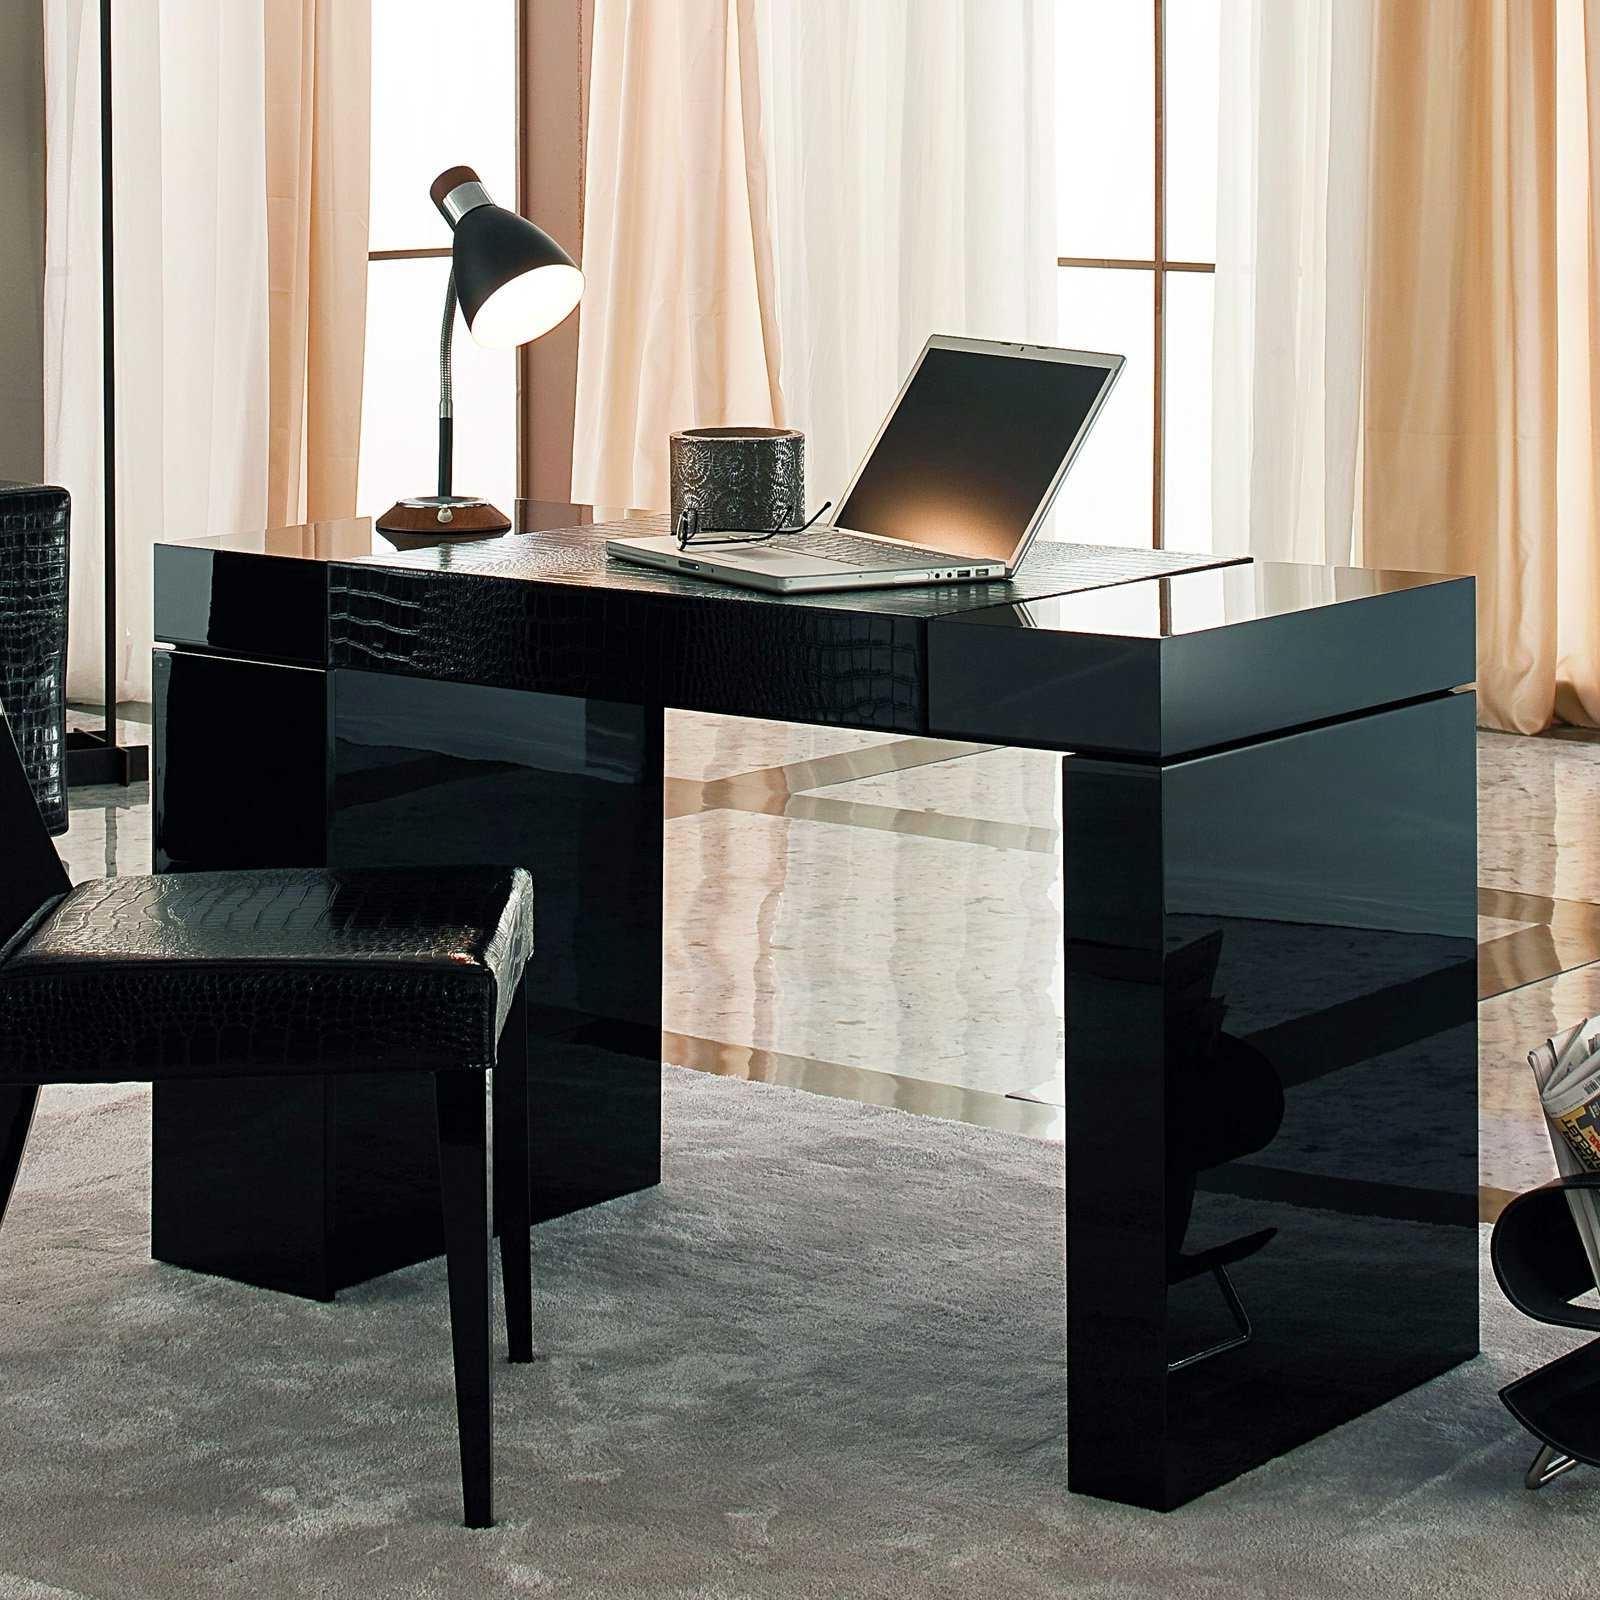 2019 Luxury Modern Computer Desk – Furniture Beech Puter Desk Room With Regard To Modern Computer Desks (View 12 of 20)